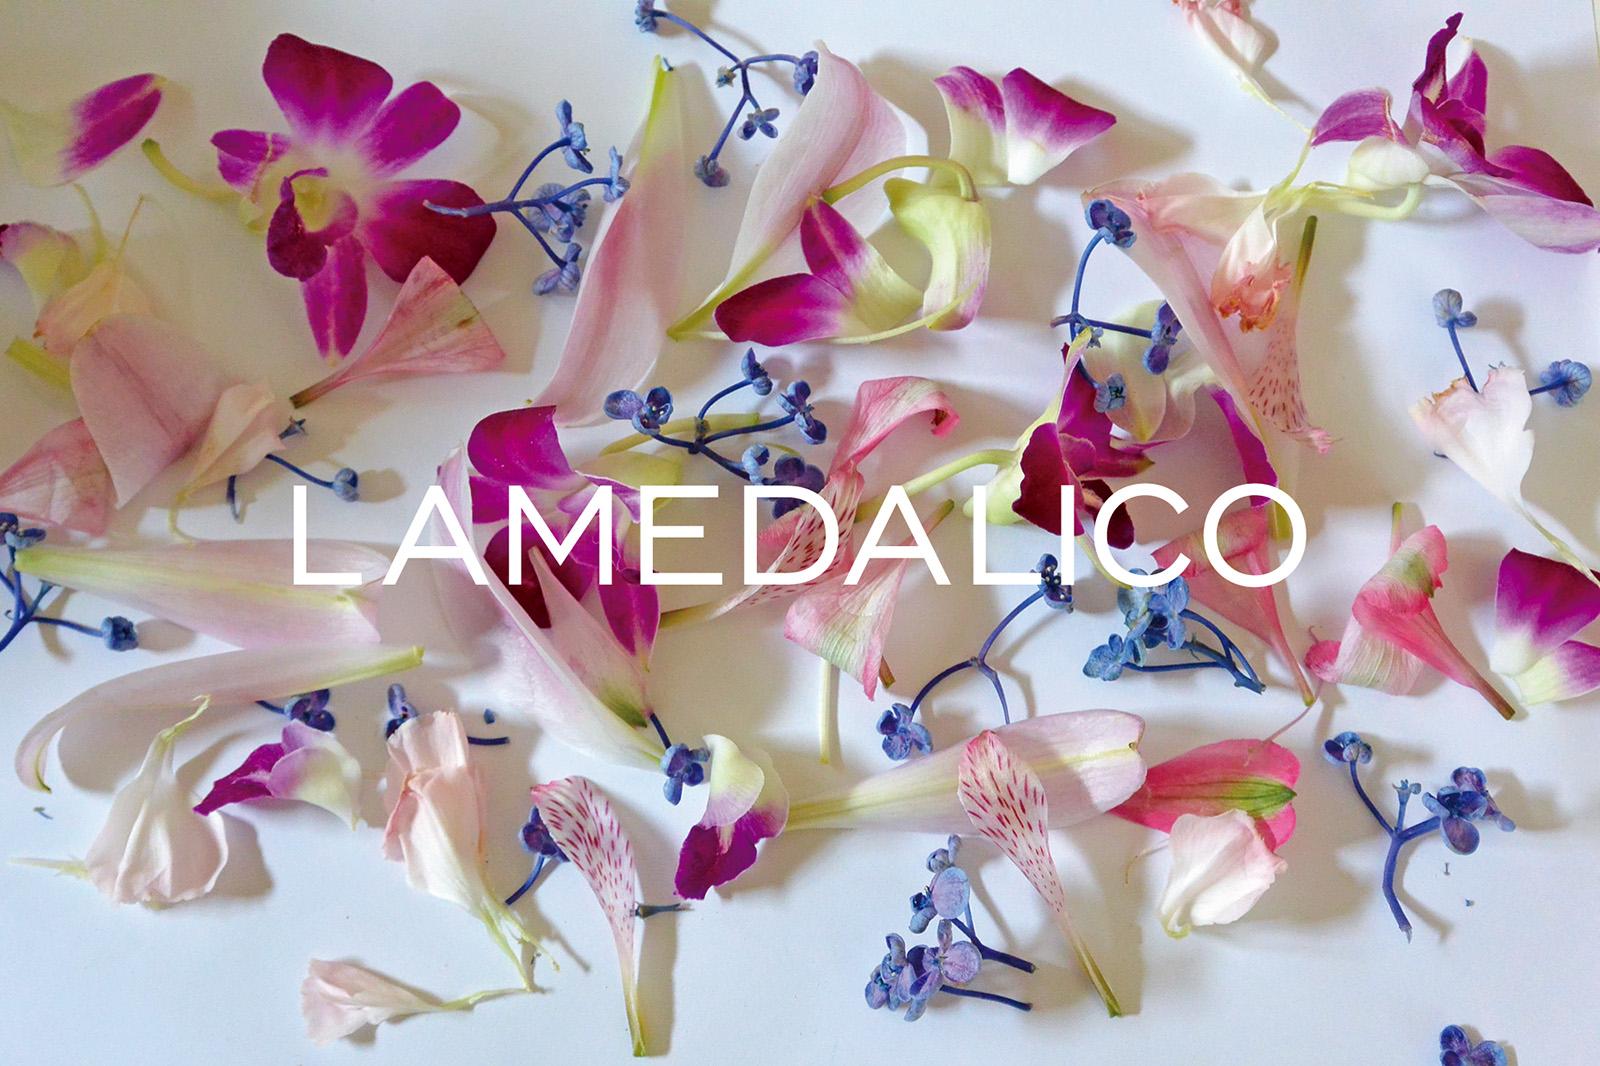 LAMEDALICO